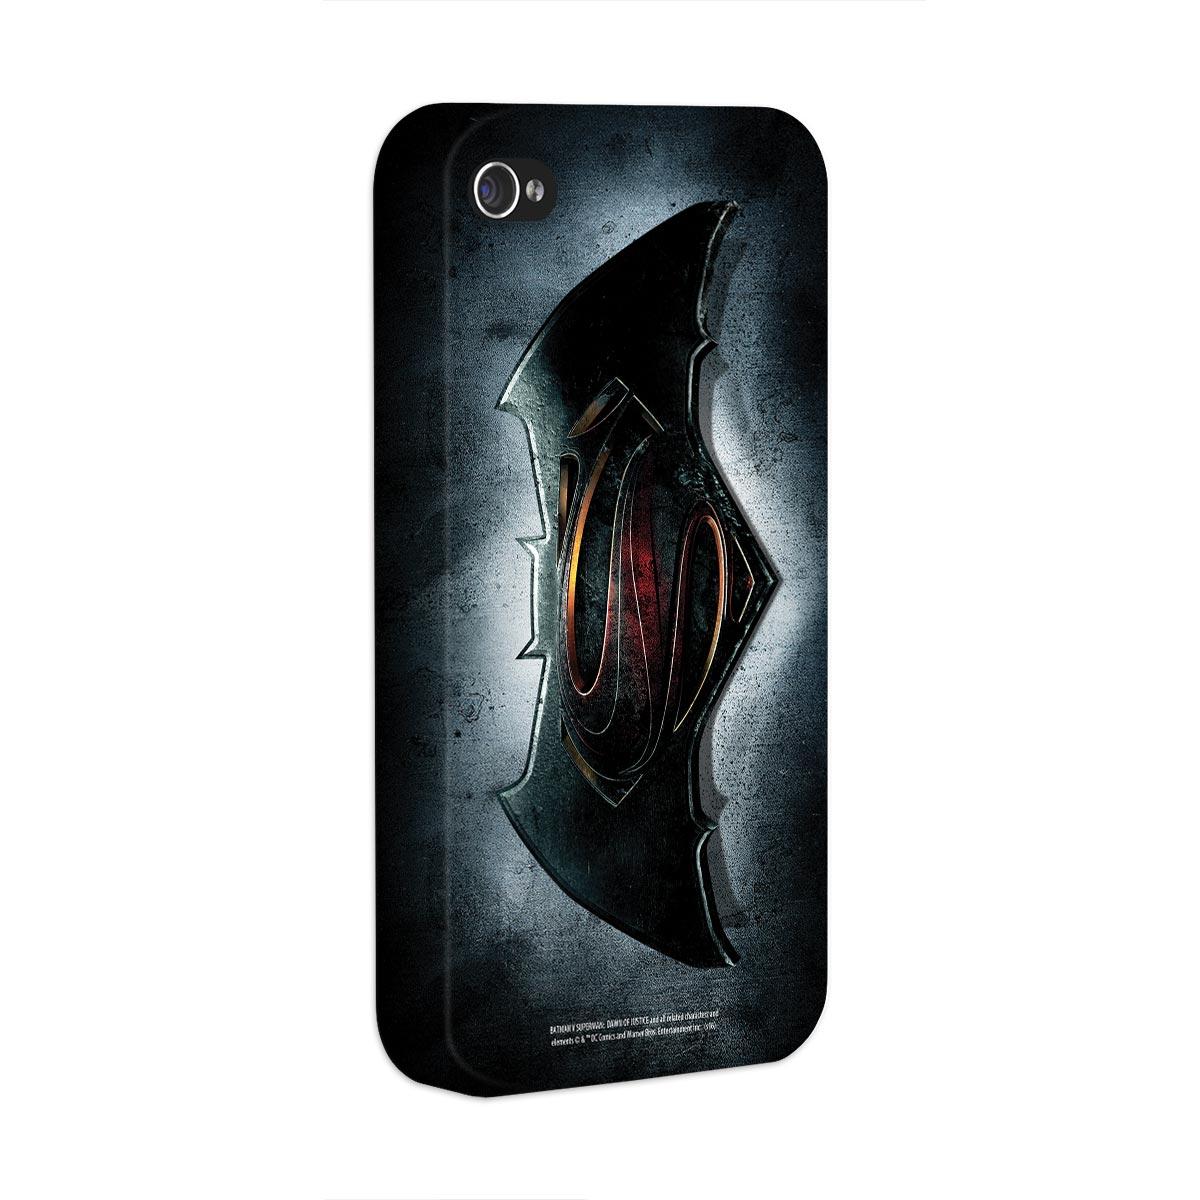 Capa para iPhone 4/4S Batman VS Superman Logo  - bandUP Store Marketplace